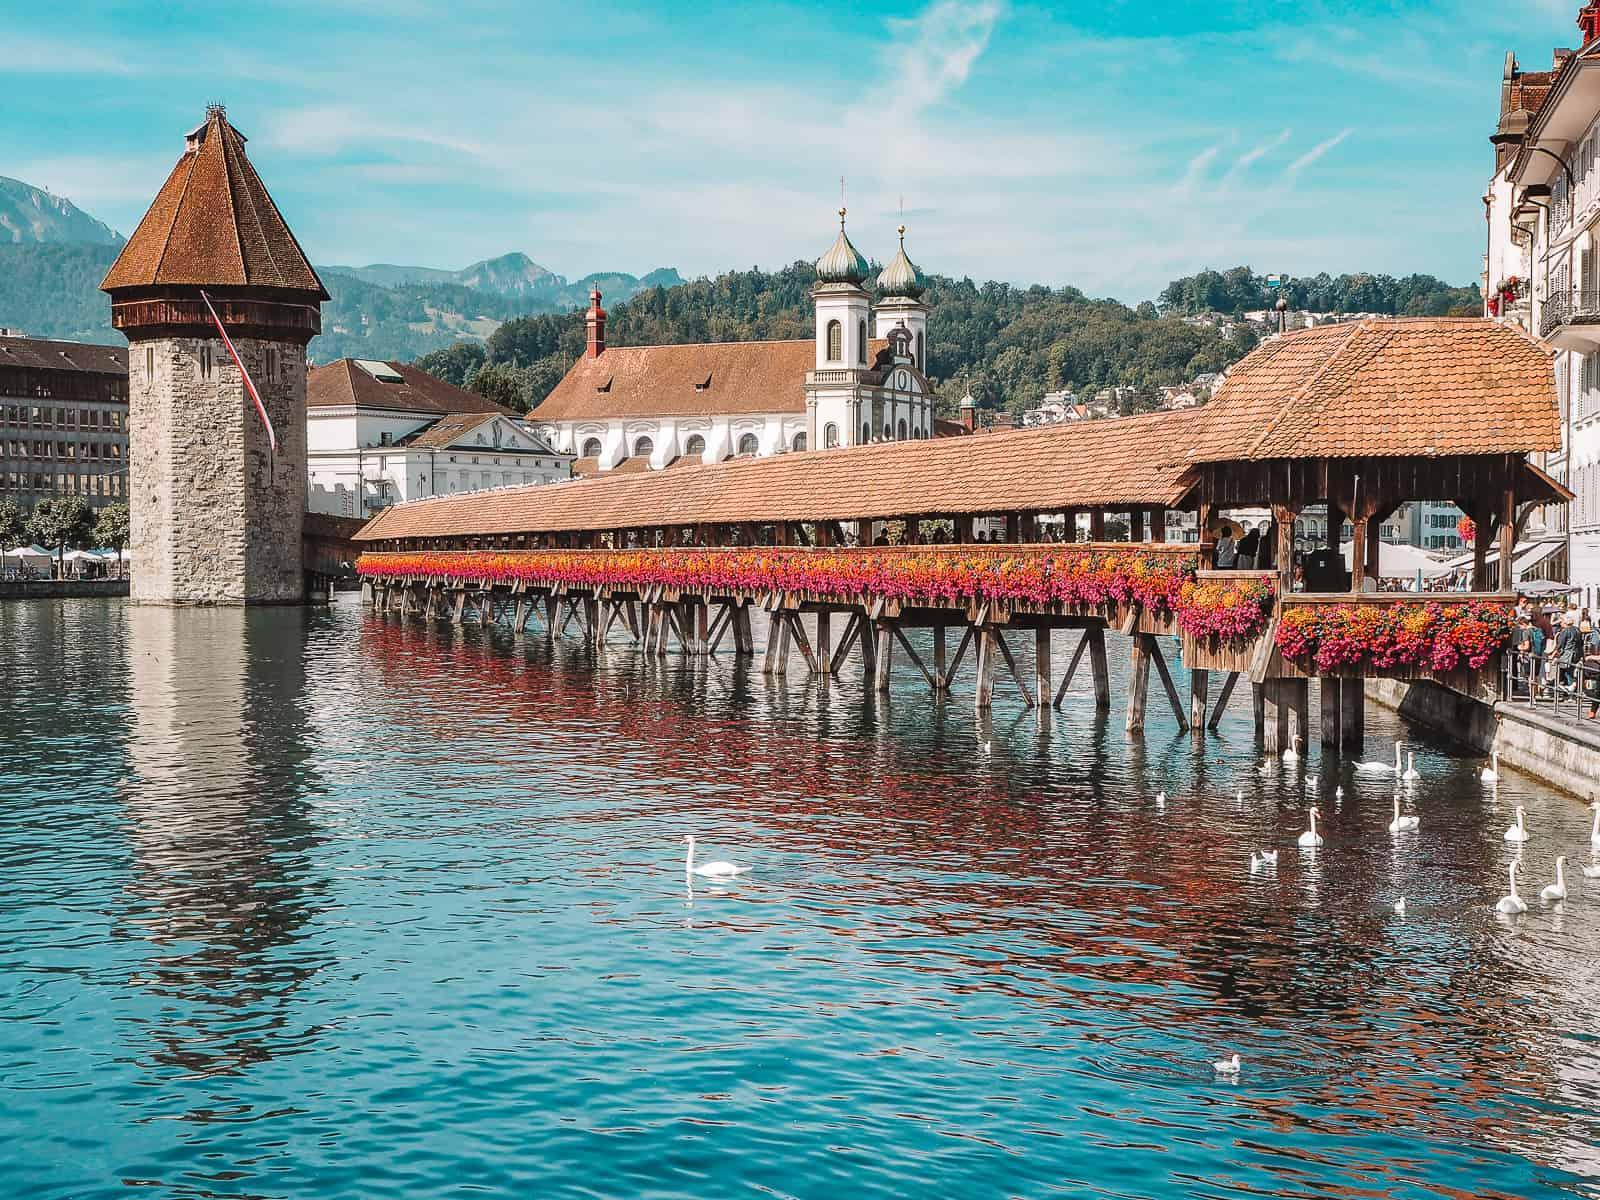 Chapel Bridge and Water Tower in Lucerne Kapellbruke